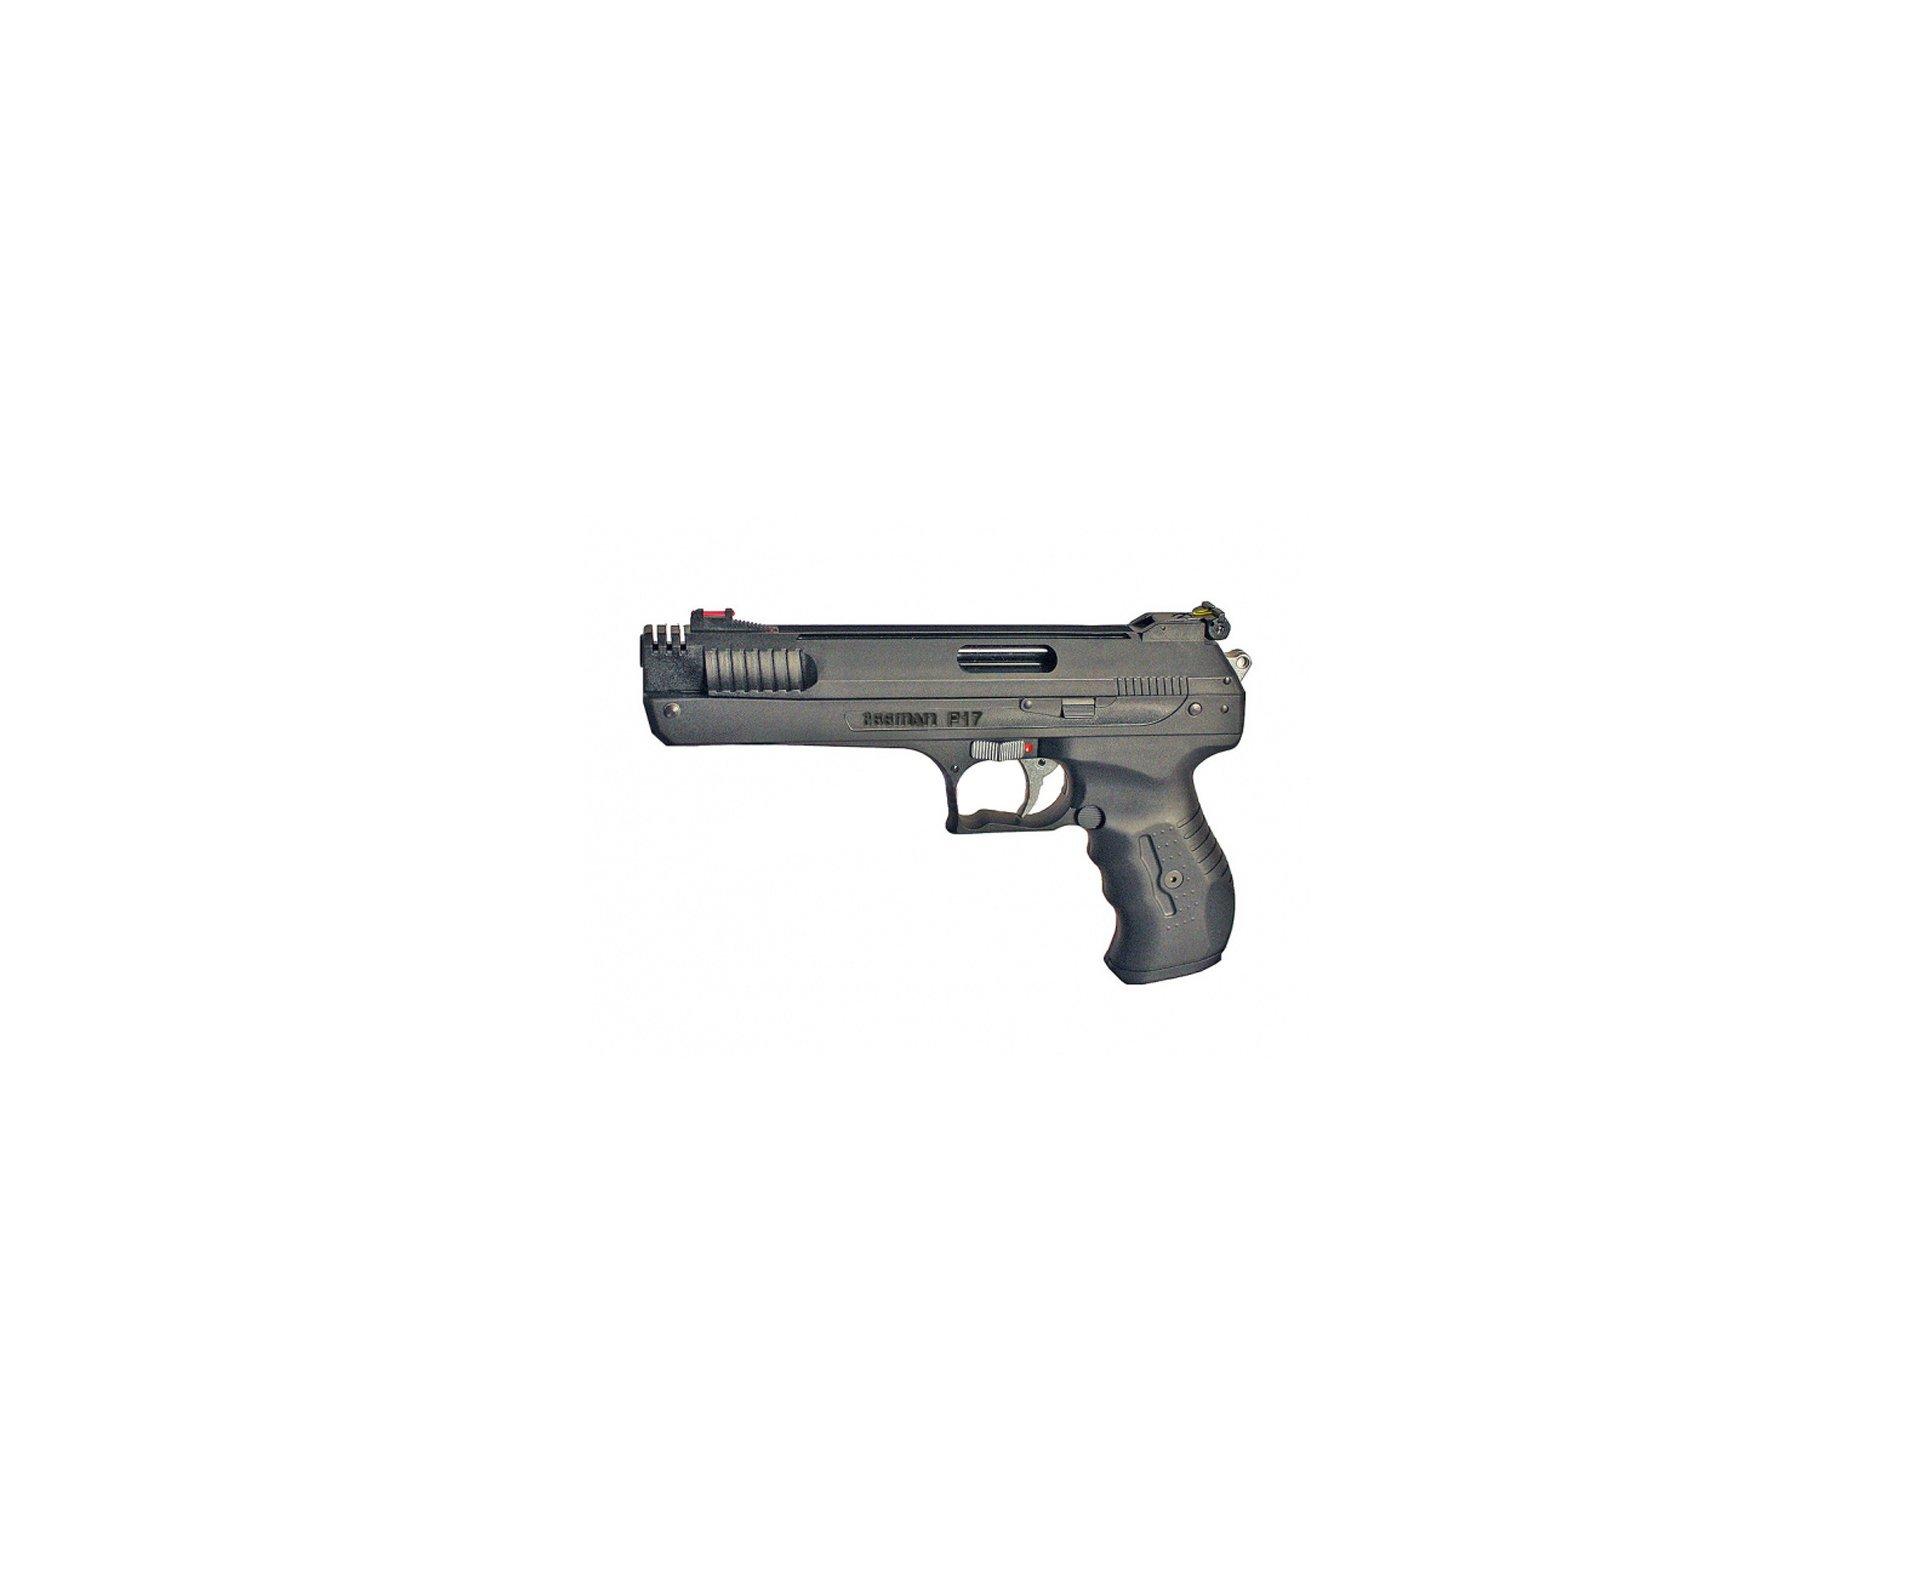 Pistola De Pressão Beeman 2004 P-17 - Cal 4,5mm + Chumbinhos - Beeman